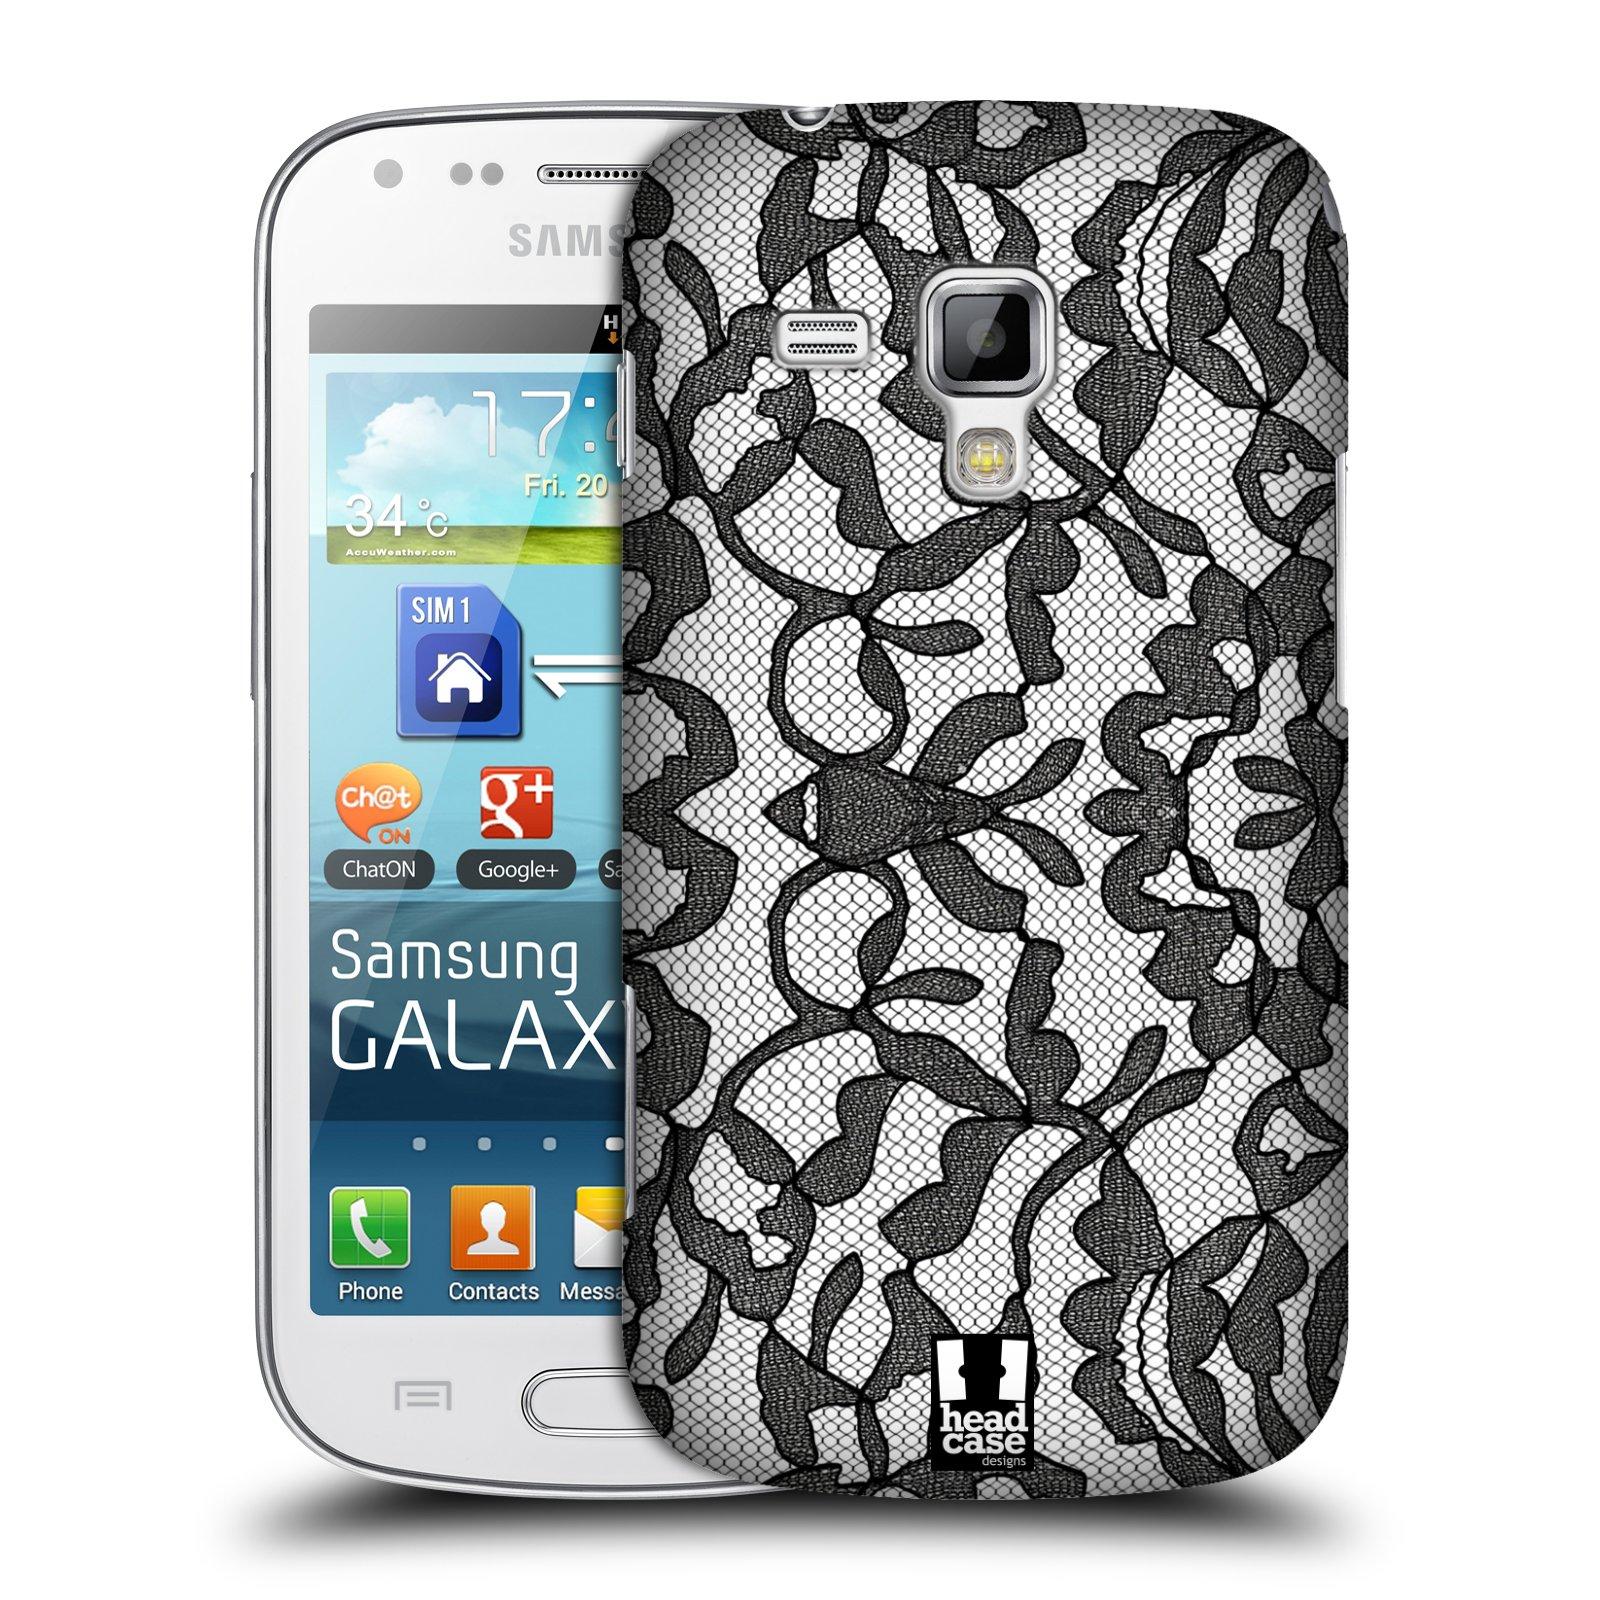 Plastové pouzdro na mobil Samsung Galaxy Trend Plus HEAD CASE LEAFY KRAJKA